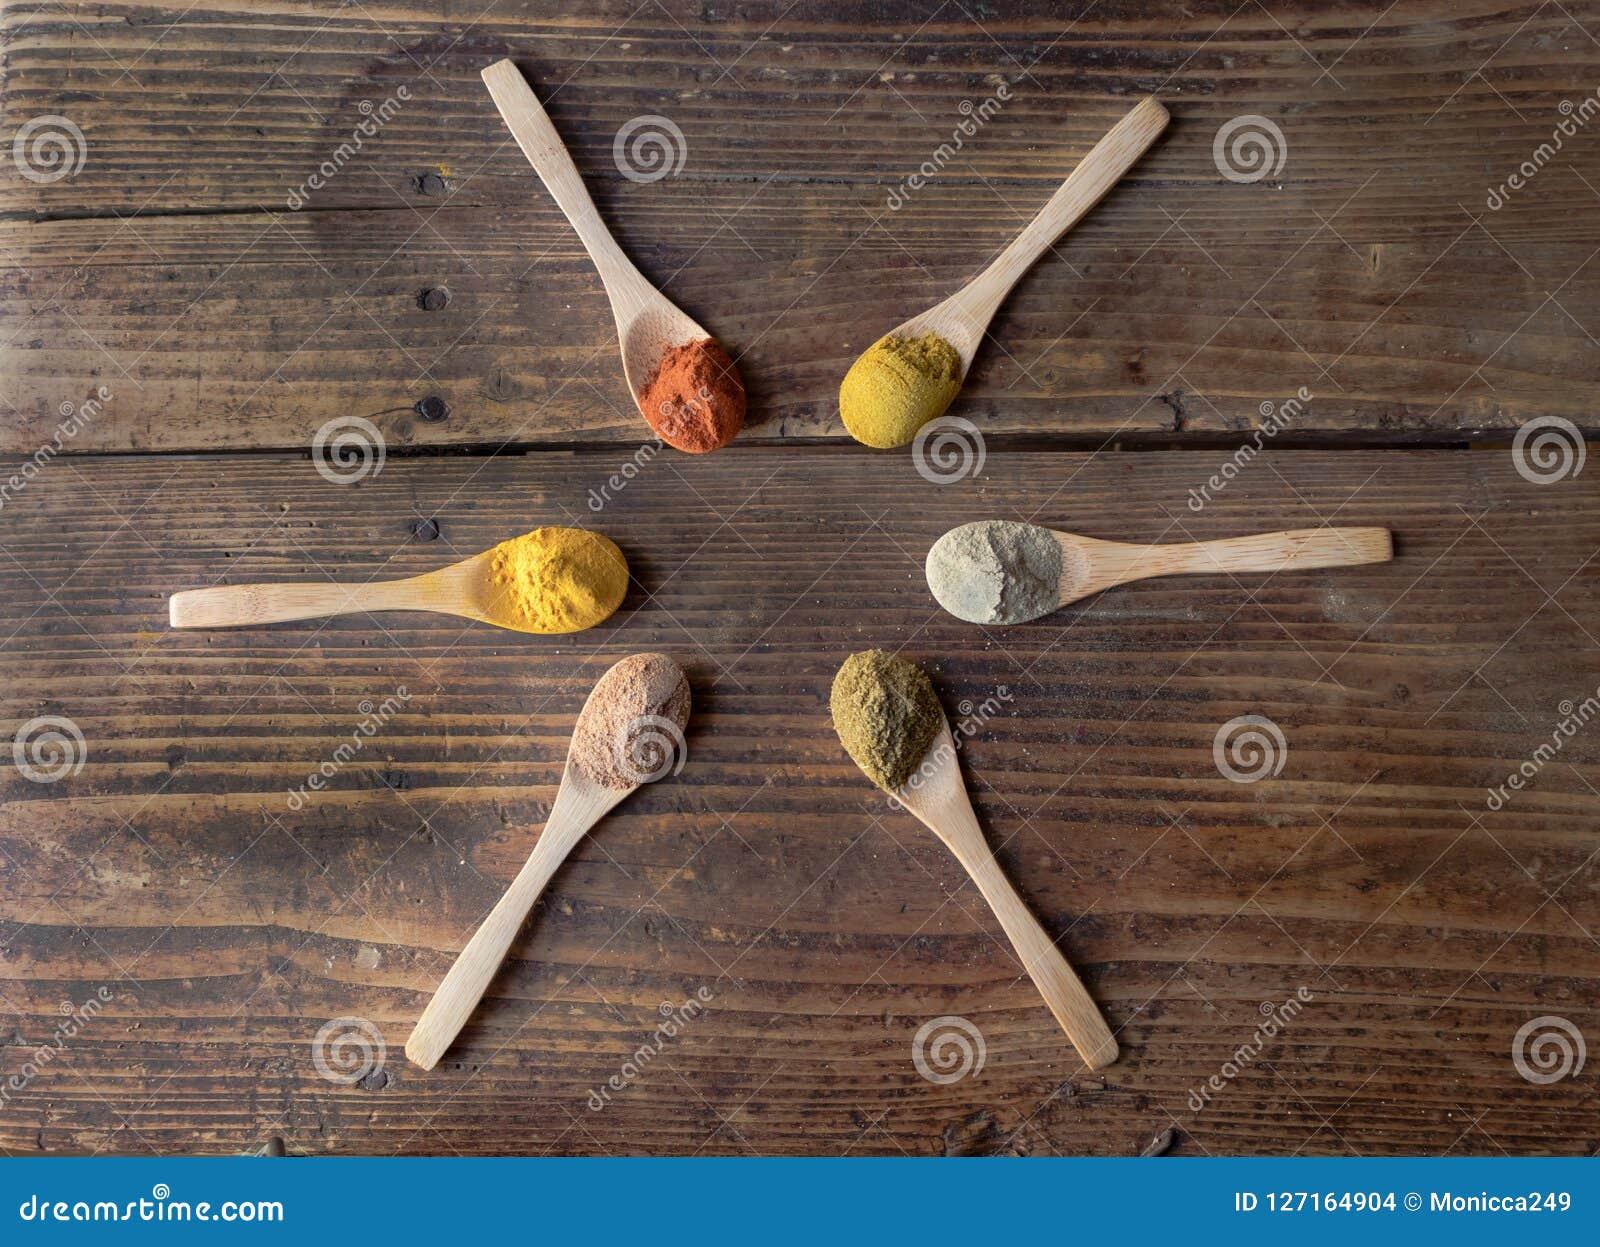 Muskotnöt, curry, paprika, spiskummin, vit peppar och gurkmeja